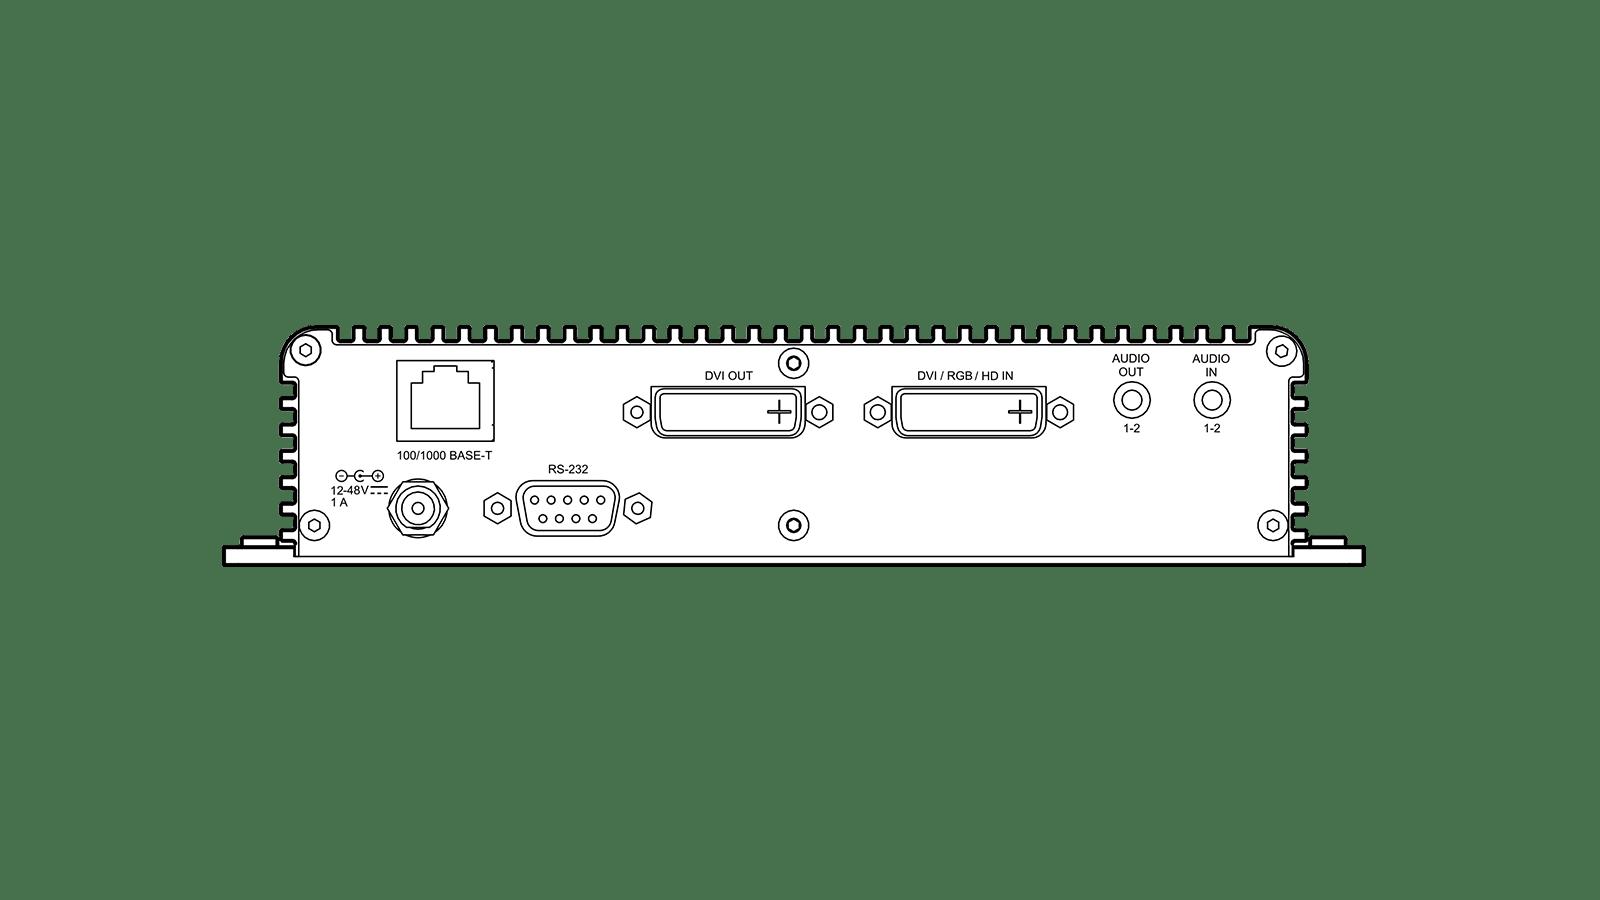 DSx 300 Back Panel